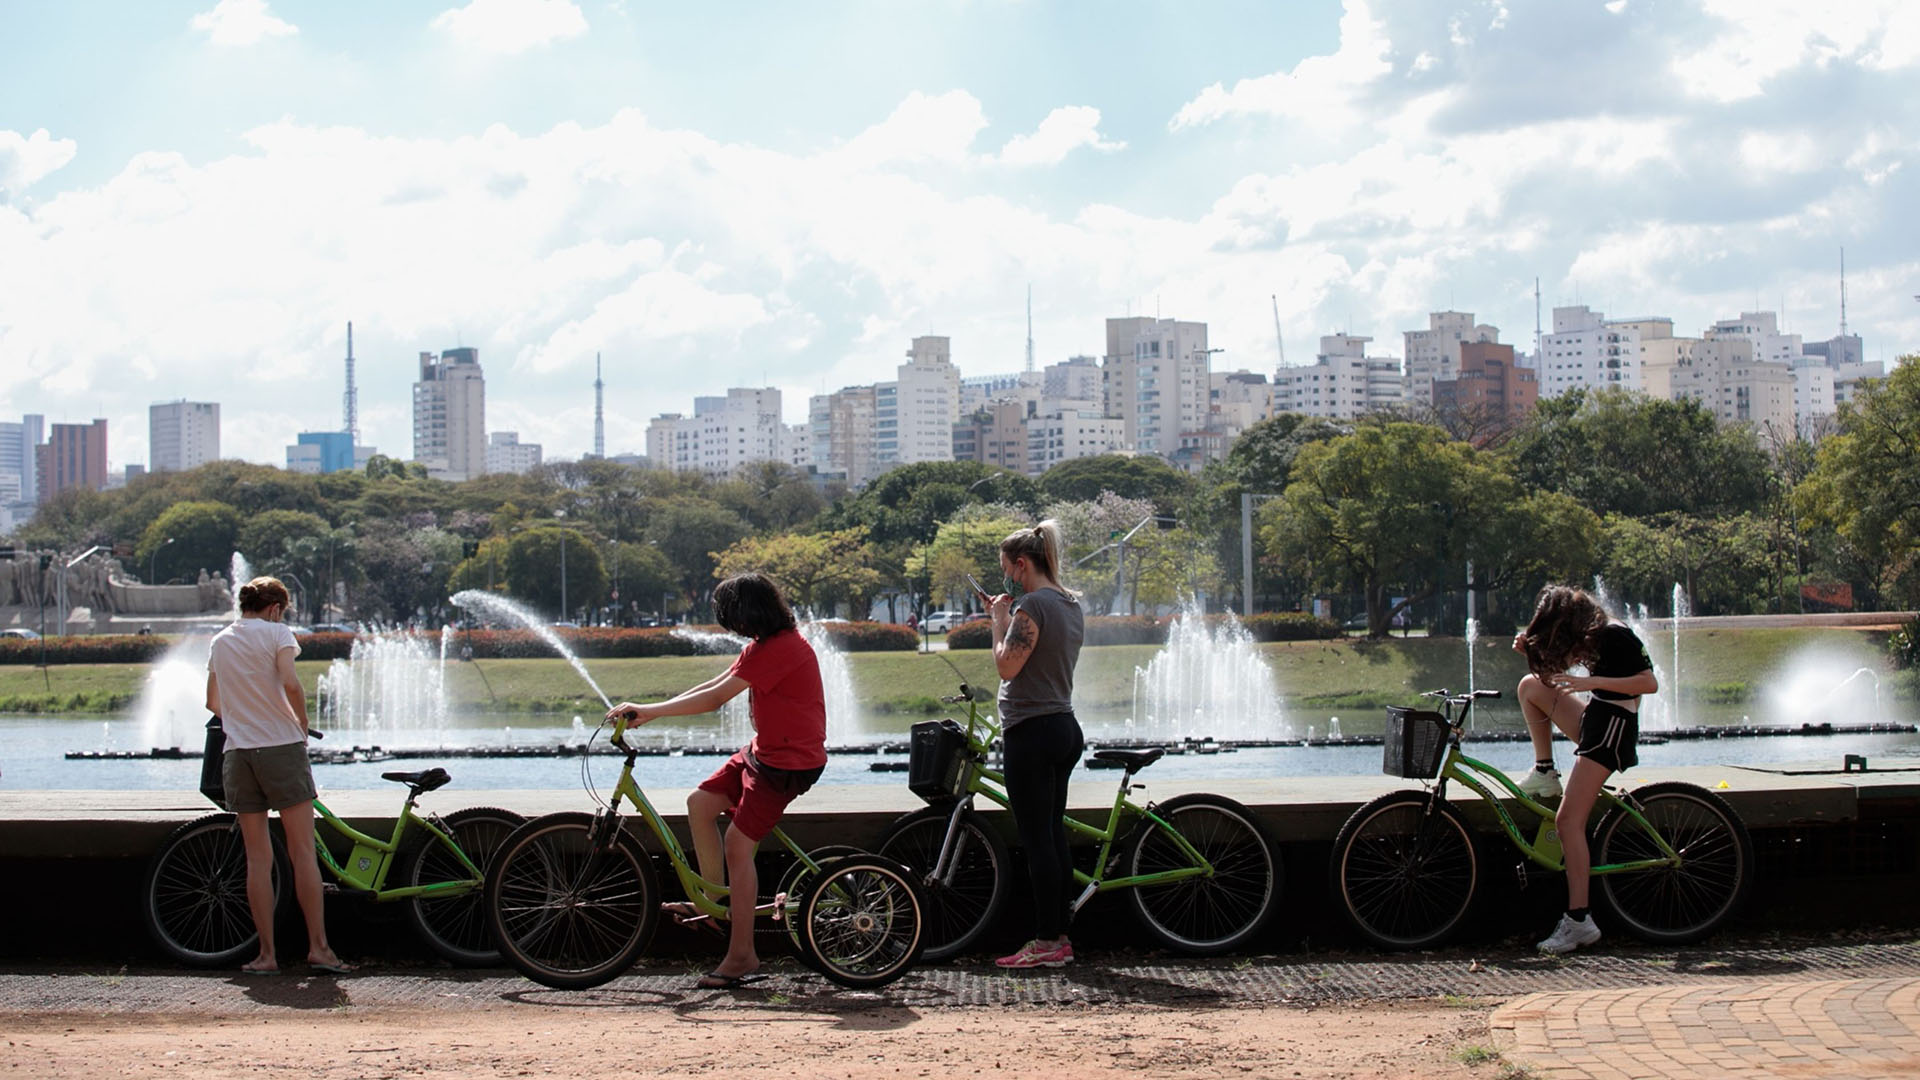 Personas en bicicleta (Patricia Monteiro/Bloomberg)